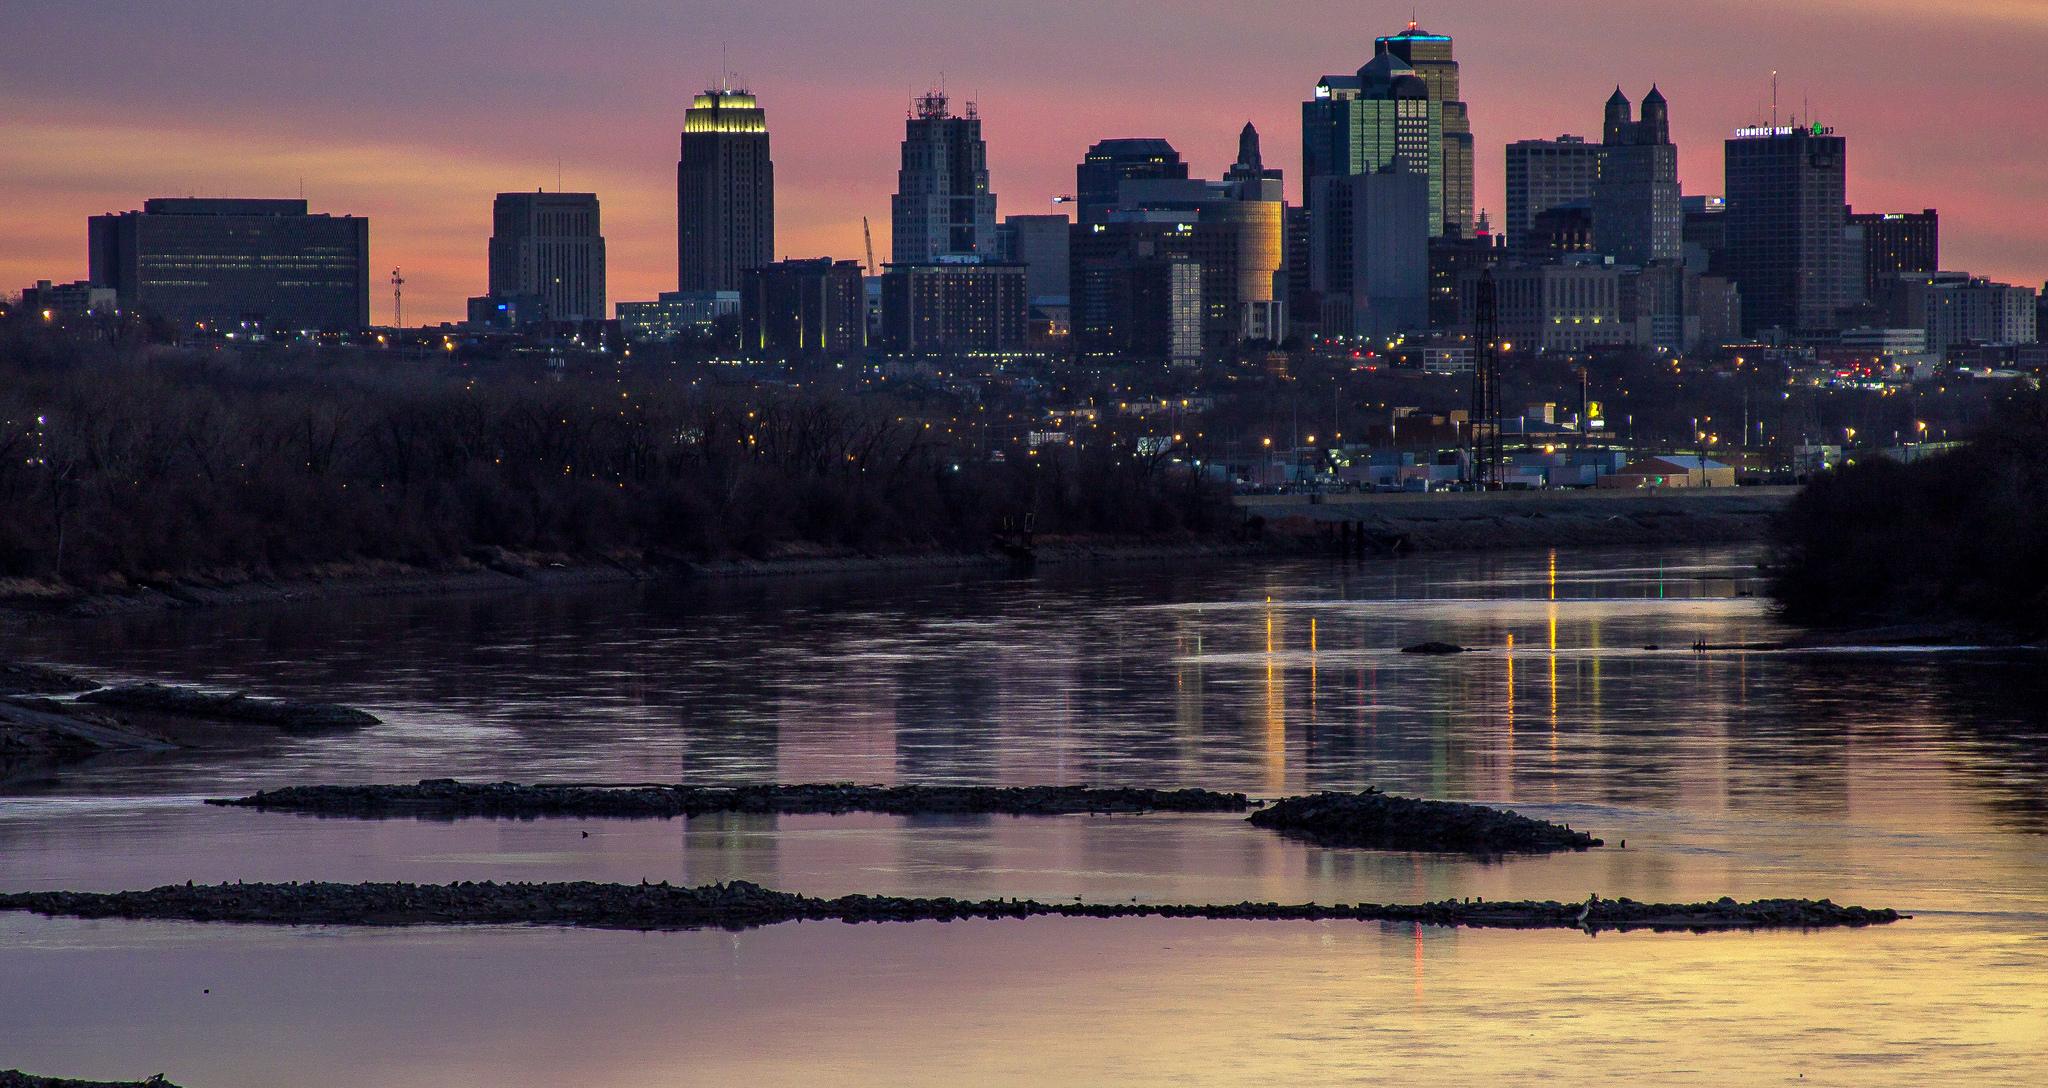 NAEP Kansas City Skyline 2019